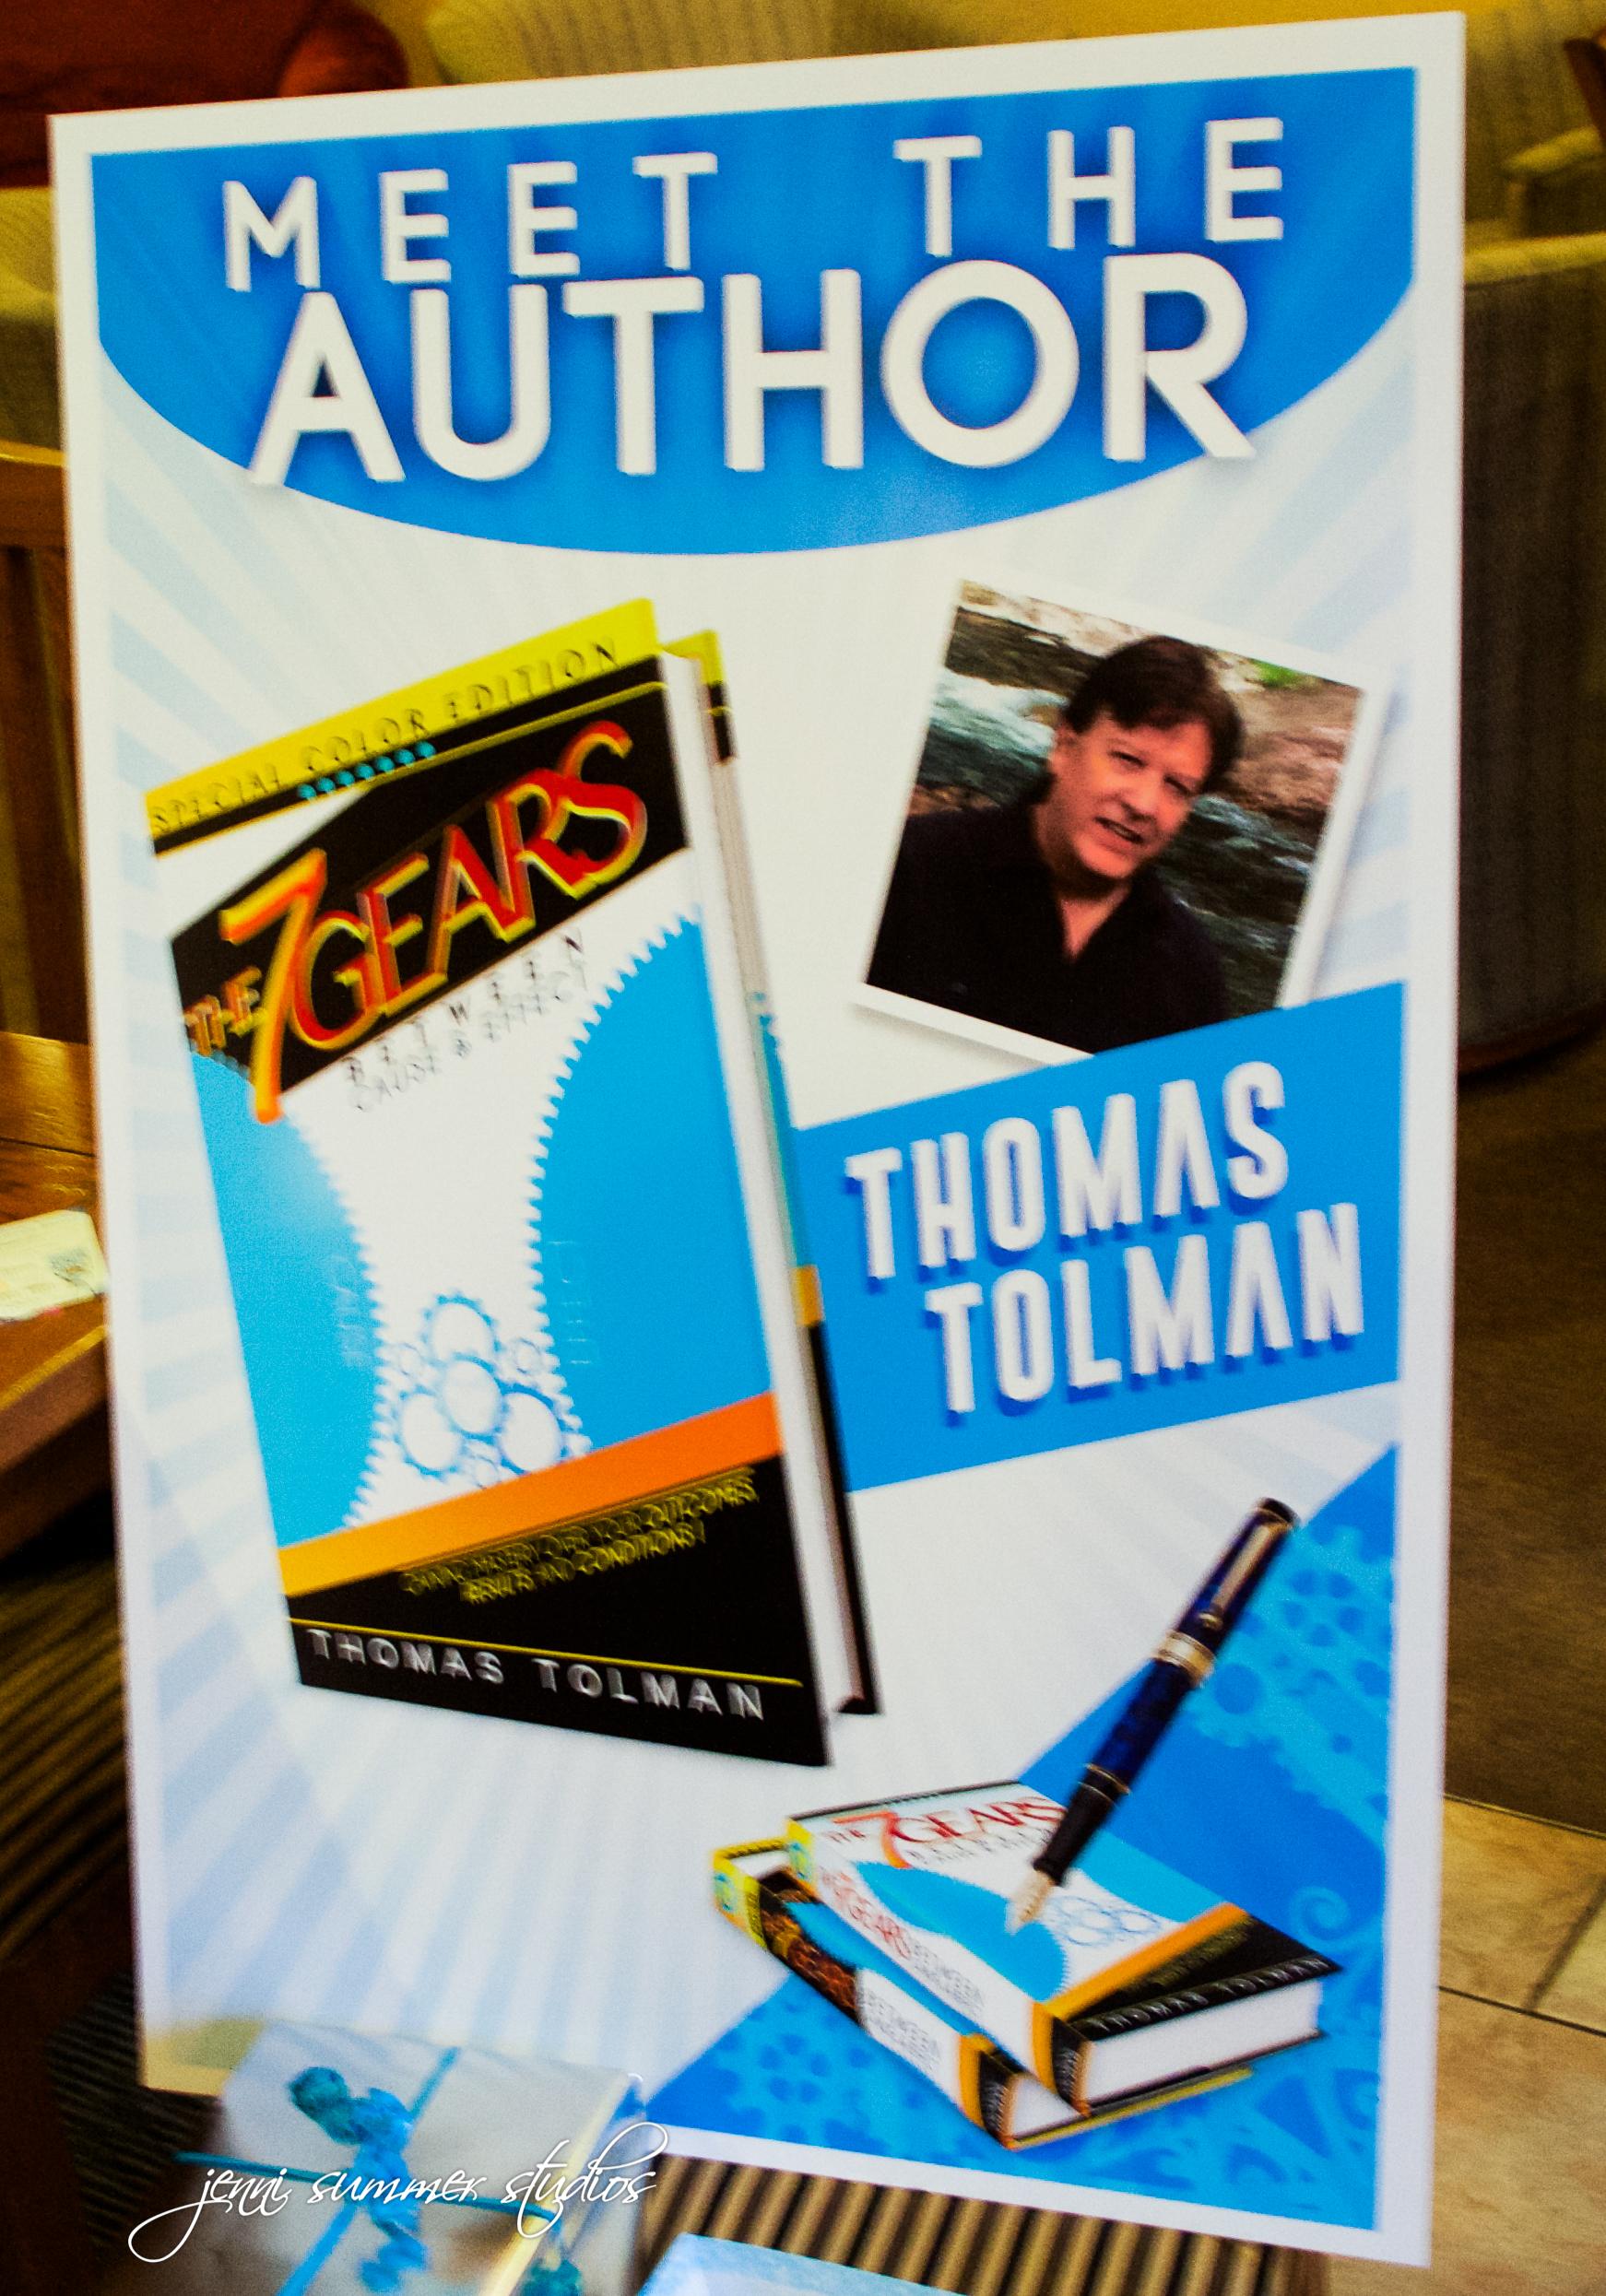 the 7 gears book launch -122.jpg